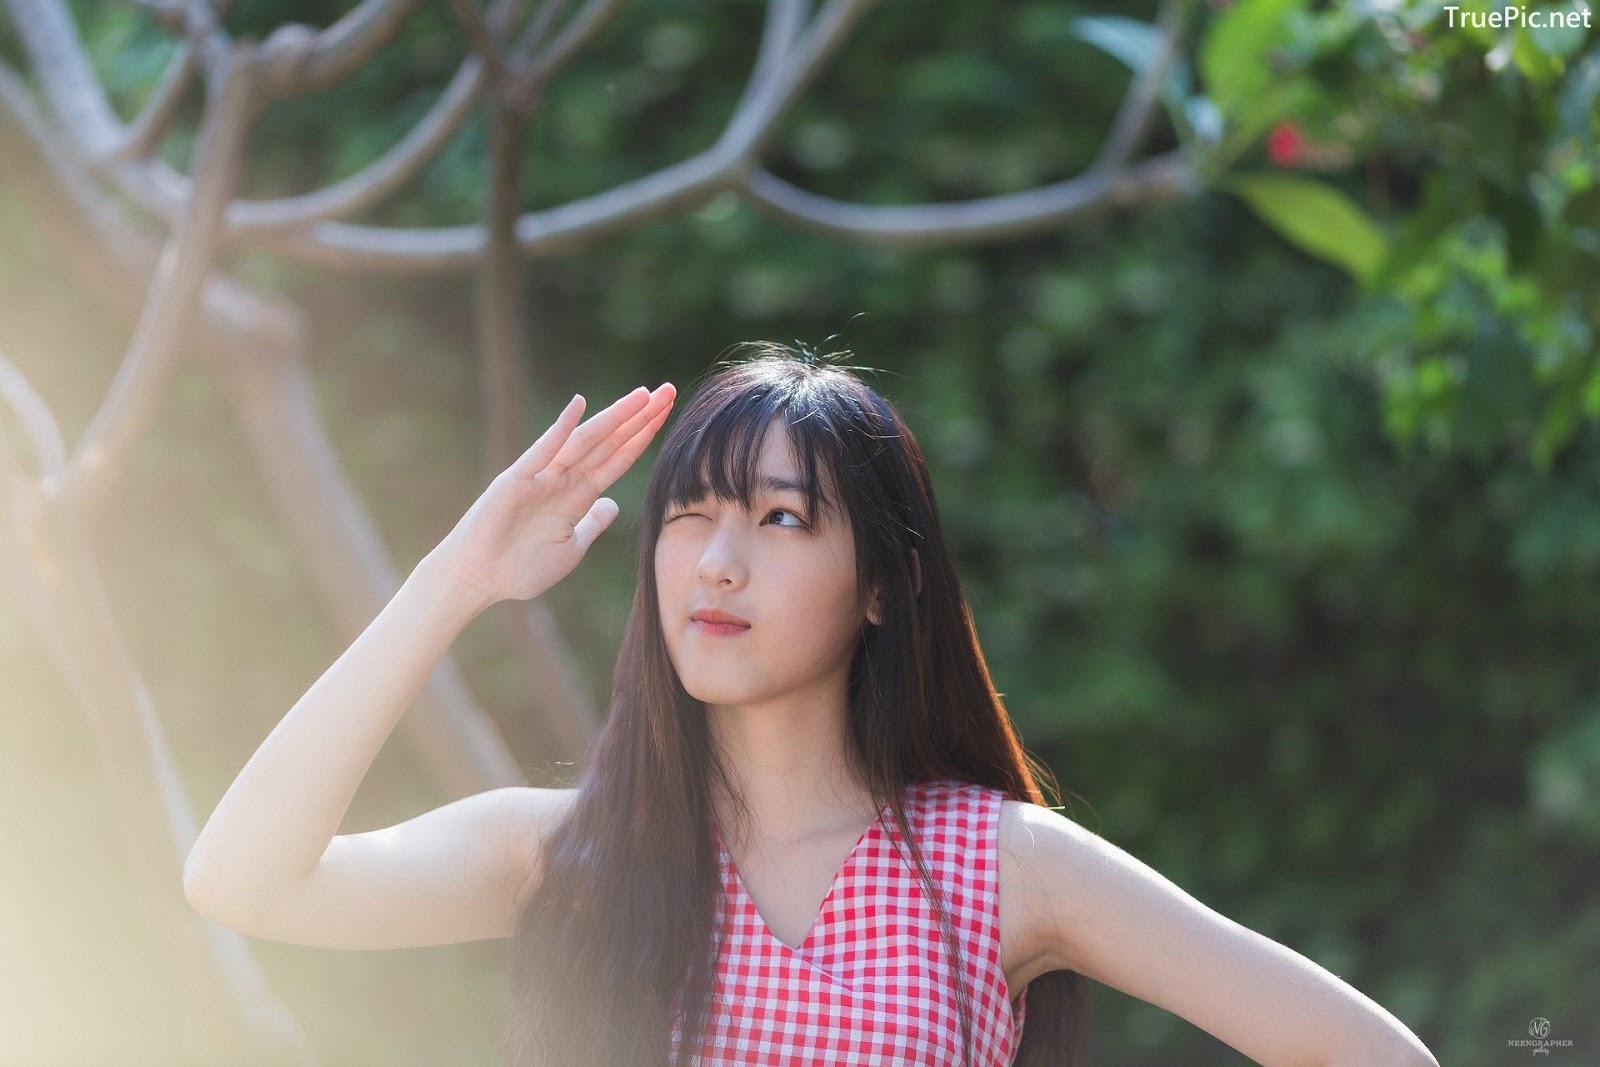 Image-Thailand-Cute-Model-Emma-Panisara–Album-Emma-Bright-Sunday-TruePic.net- Picture-20